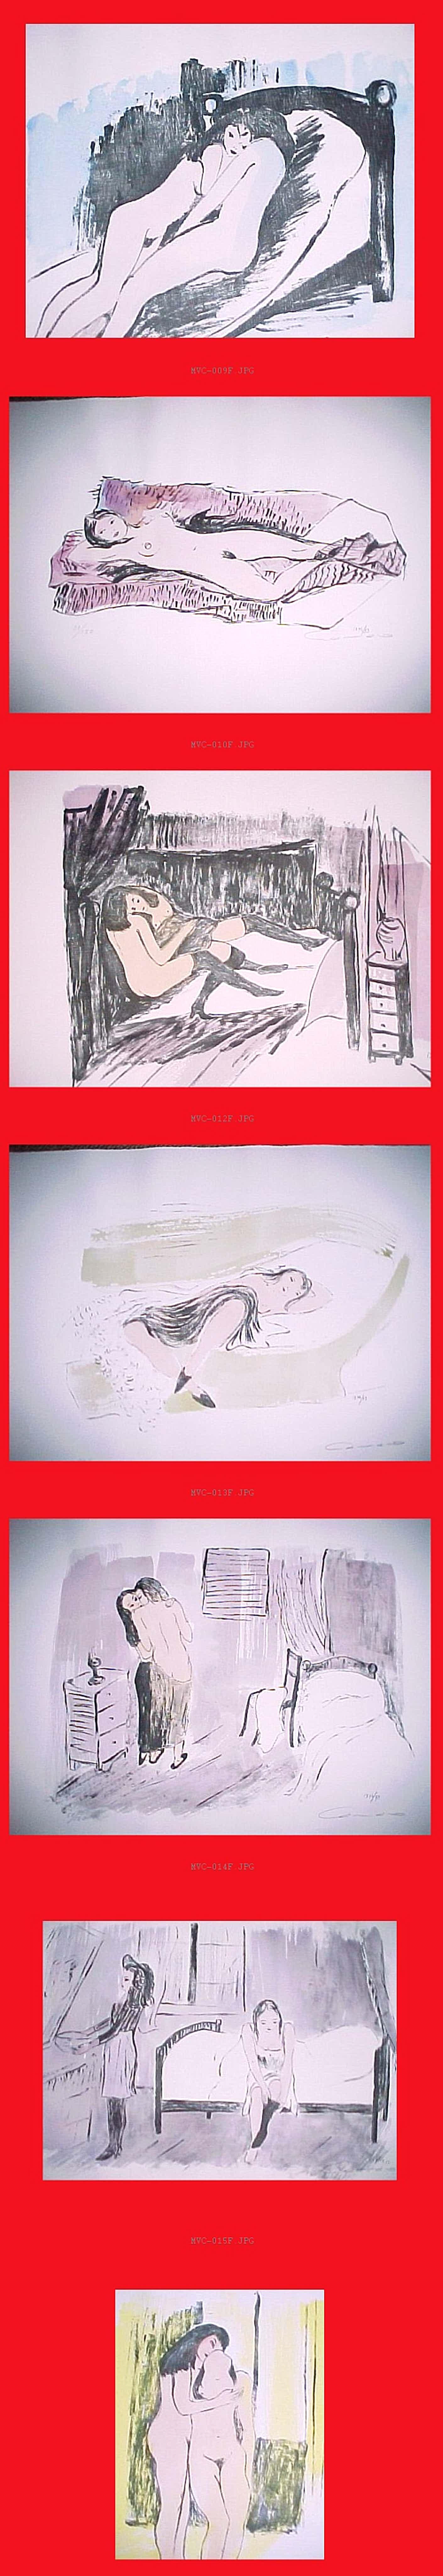 Alexander Camaro - Freundinnen, 7 aquarellierte Lithografien 1946/73 kopen? Bied vanaf 300!